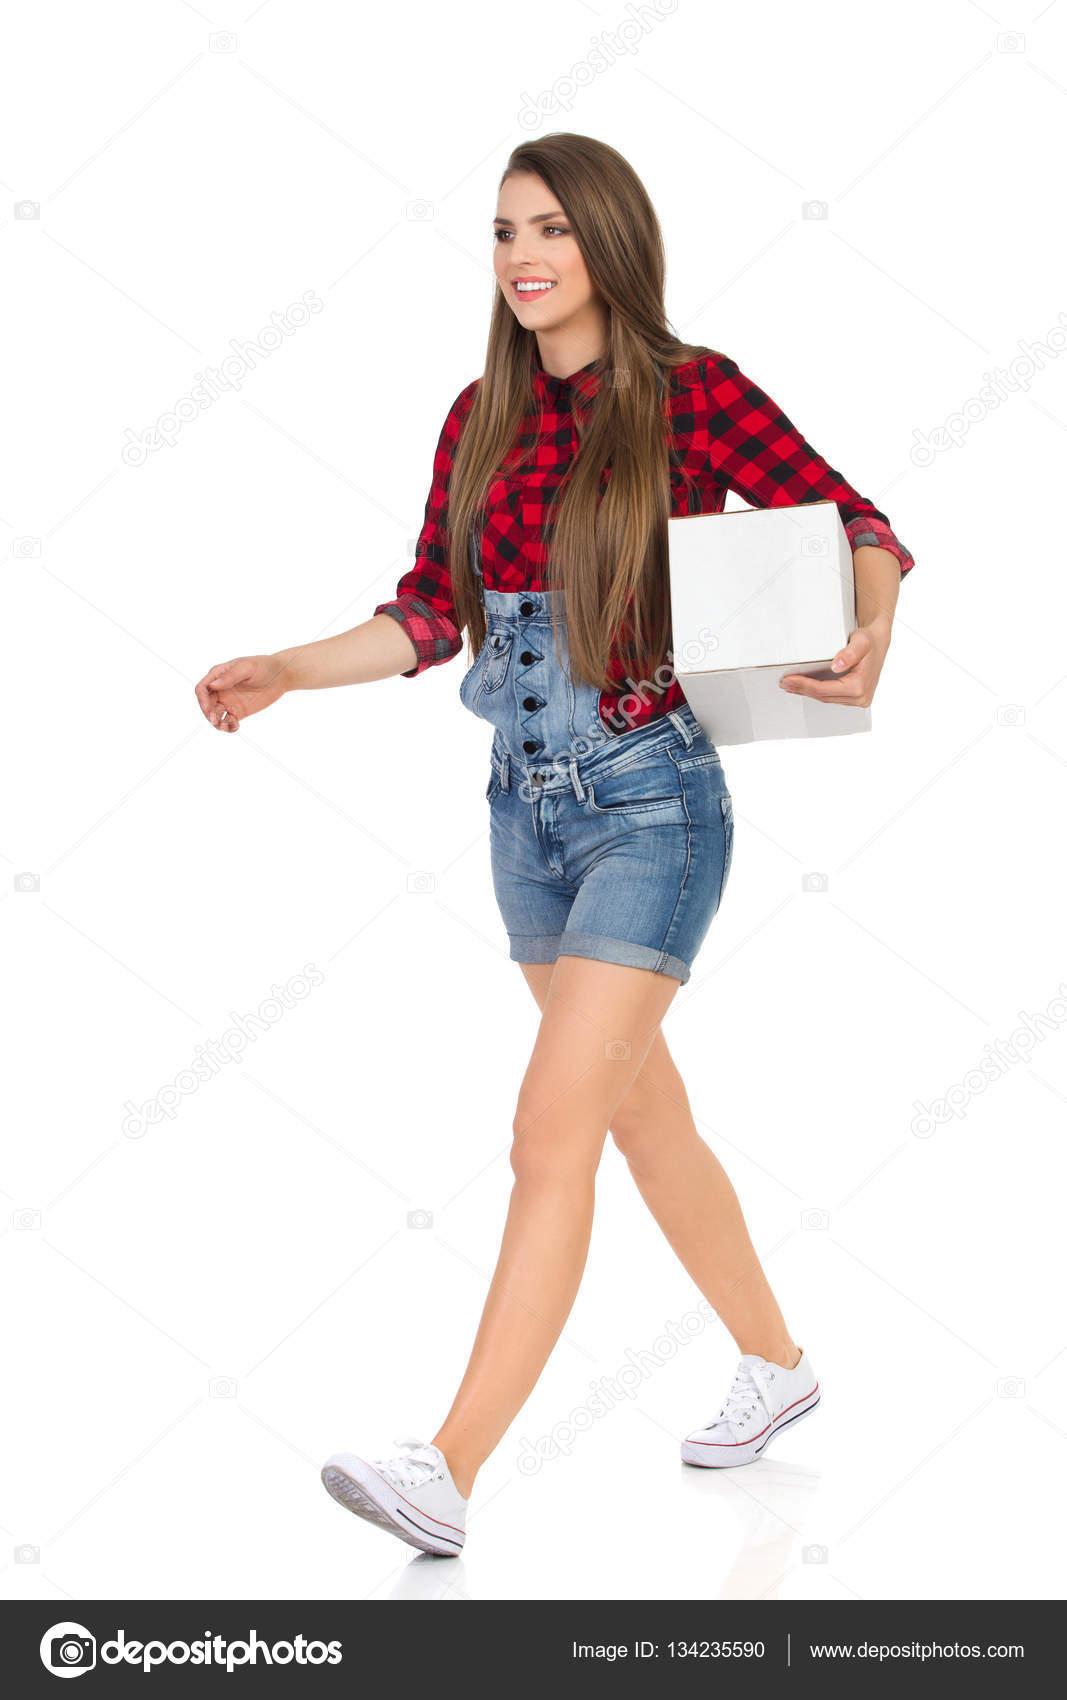 Under her shirt girl